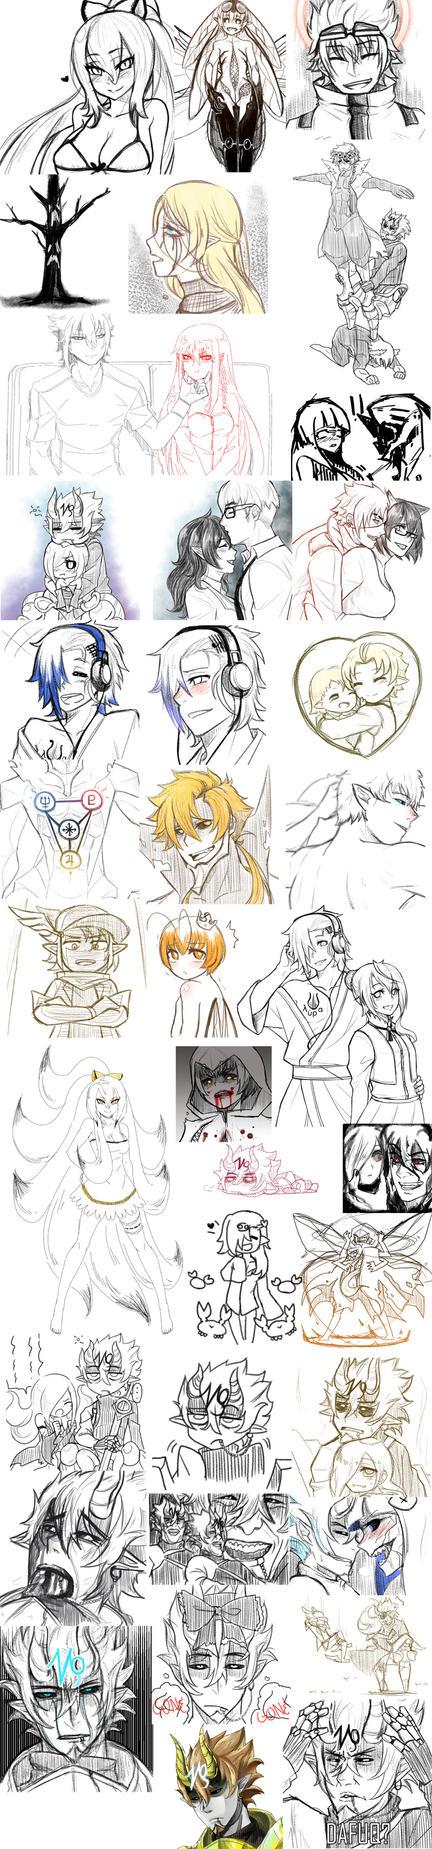 Doodles by athenabeta